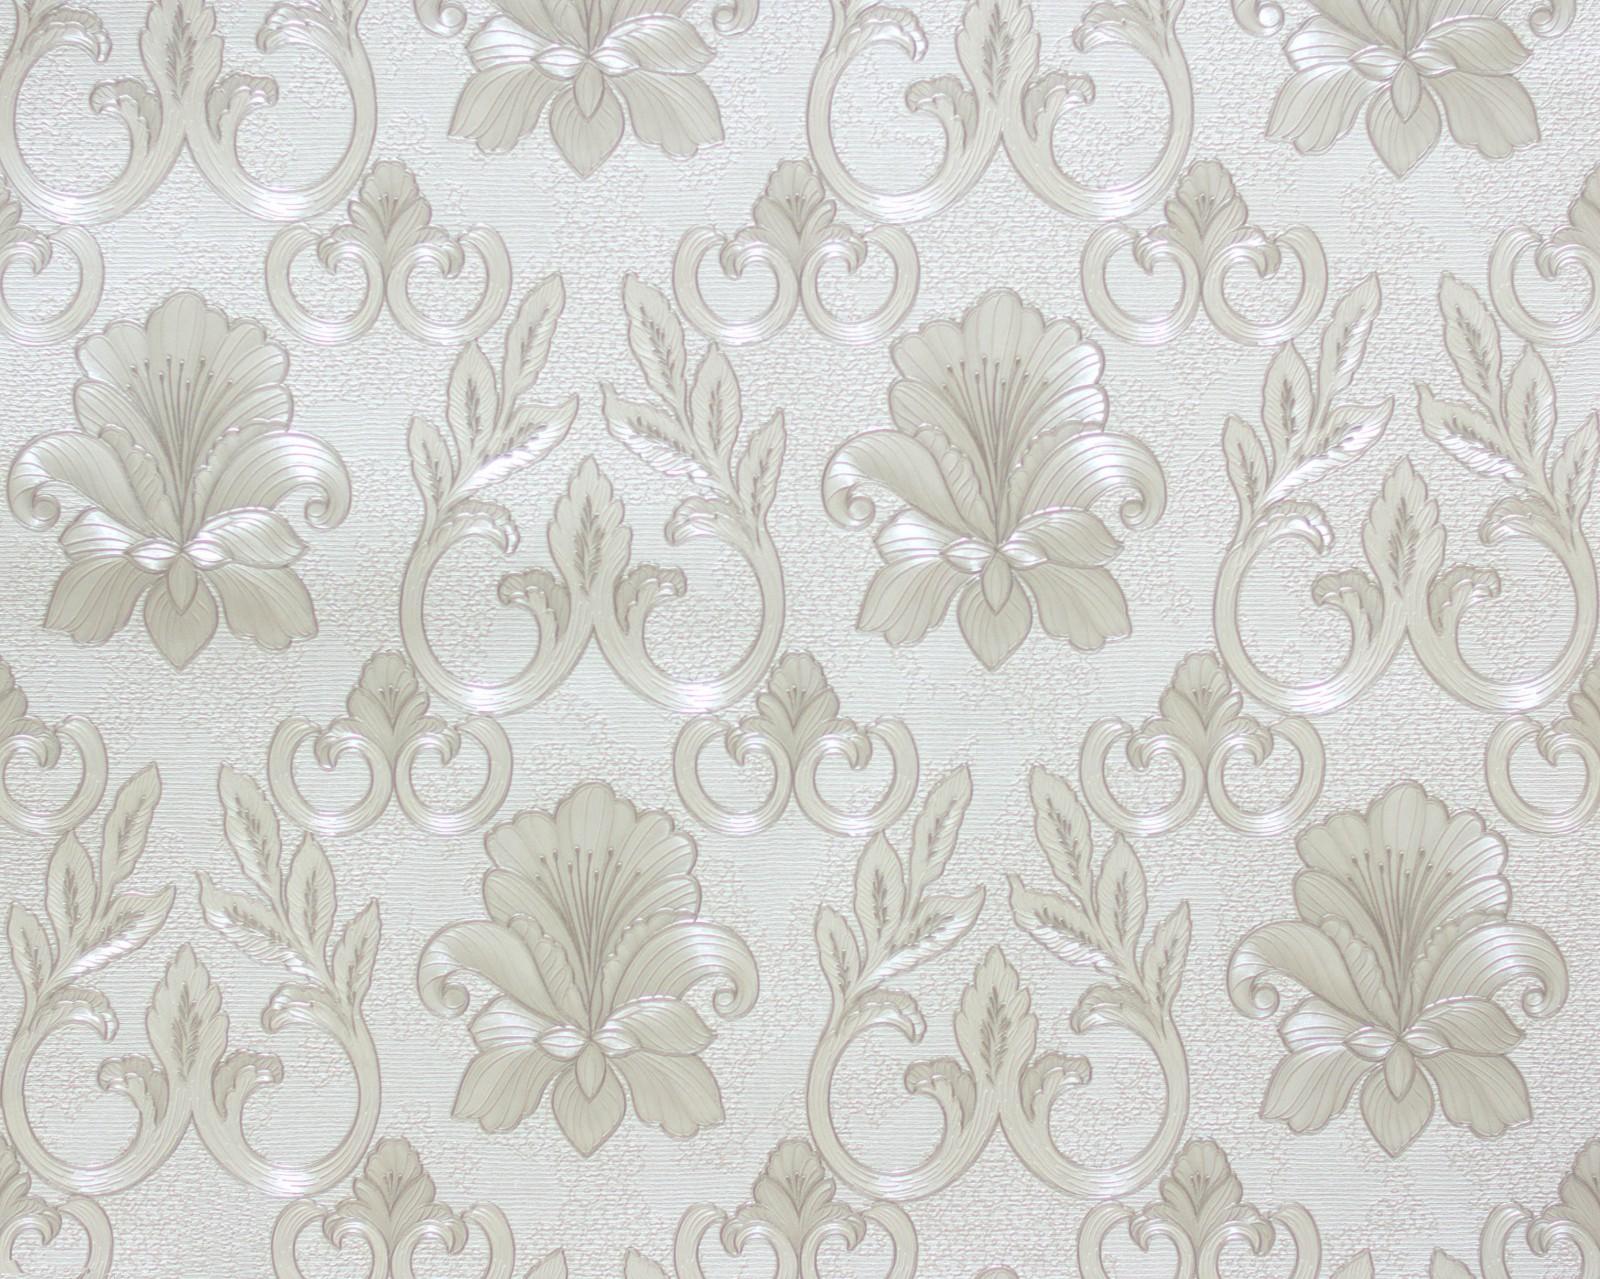 A S Hermitage 9 Non Woven Wallpaper 4 Floral